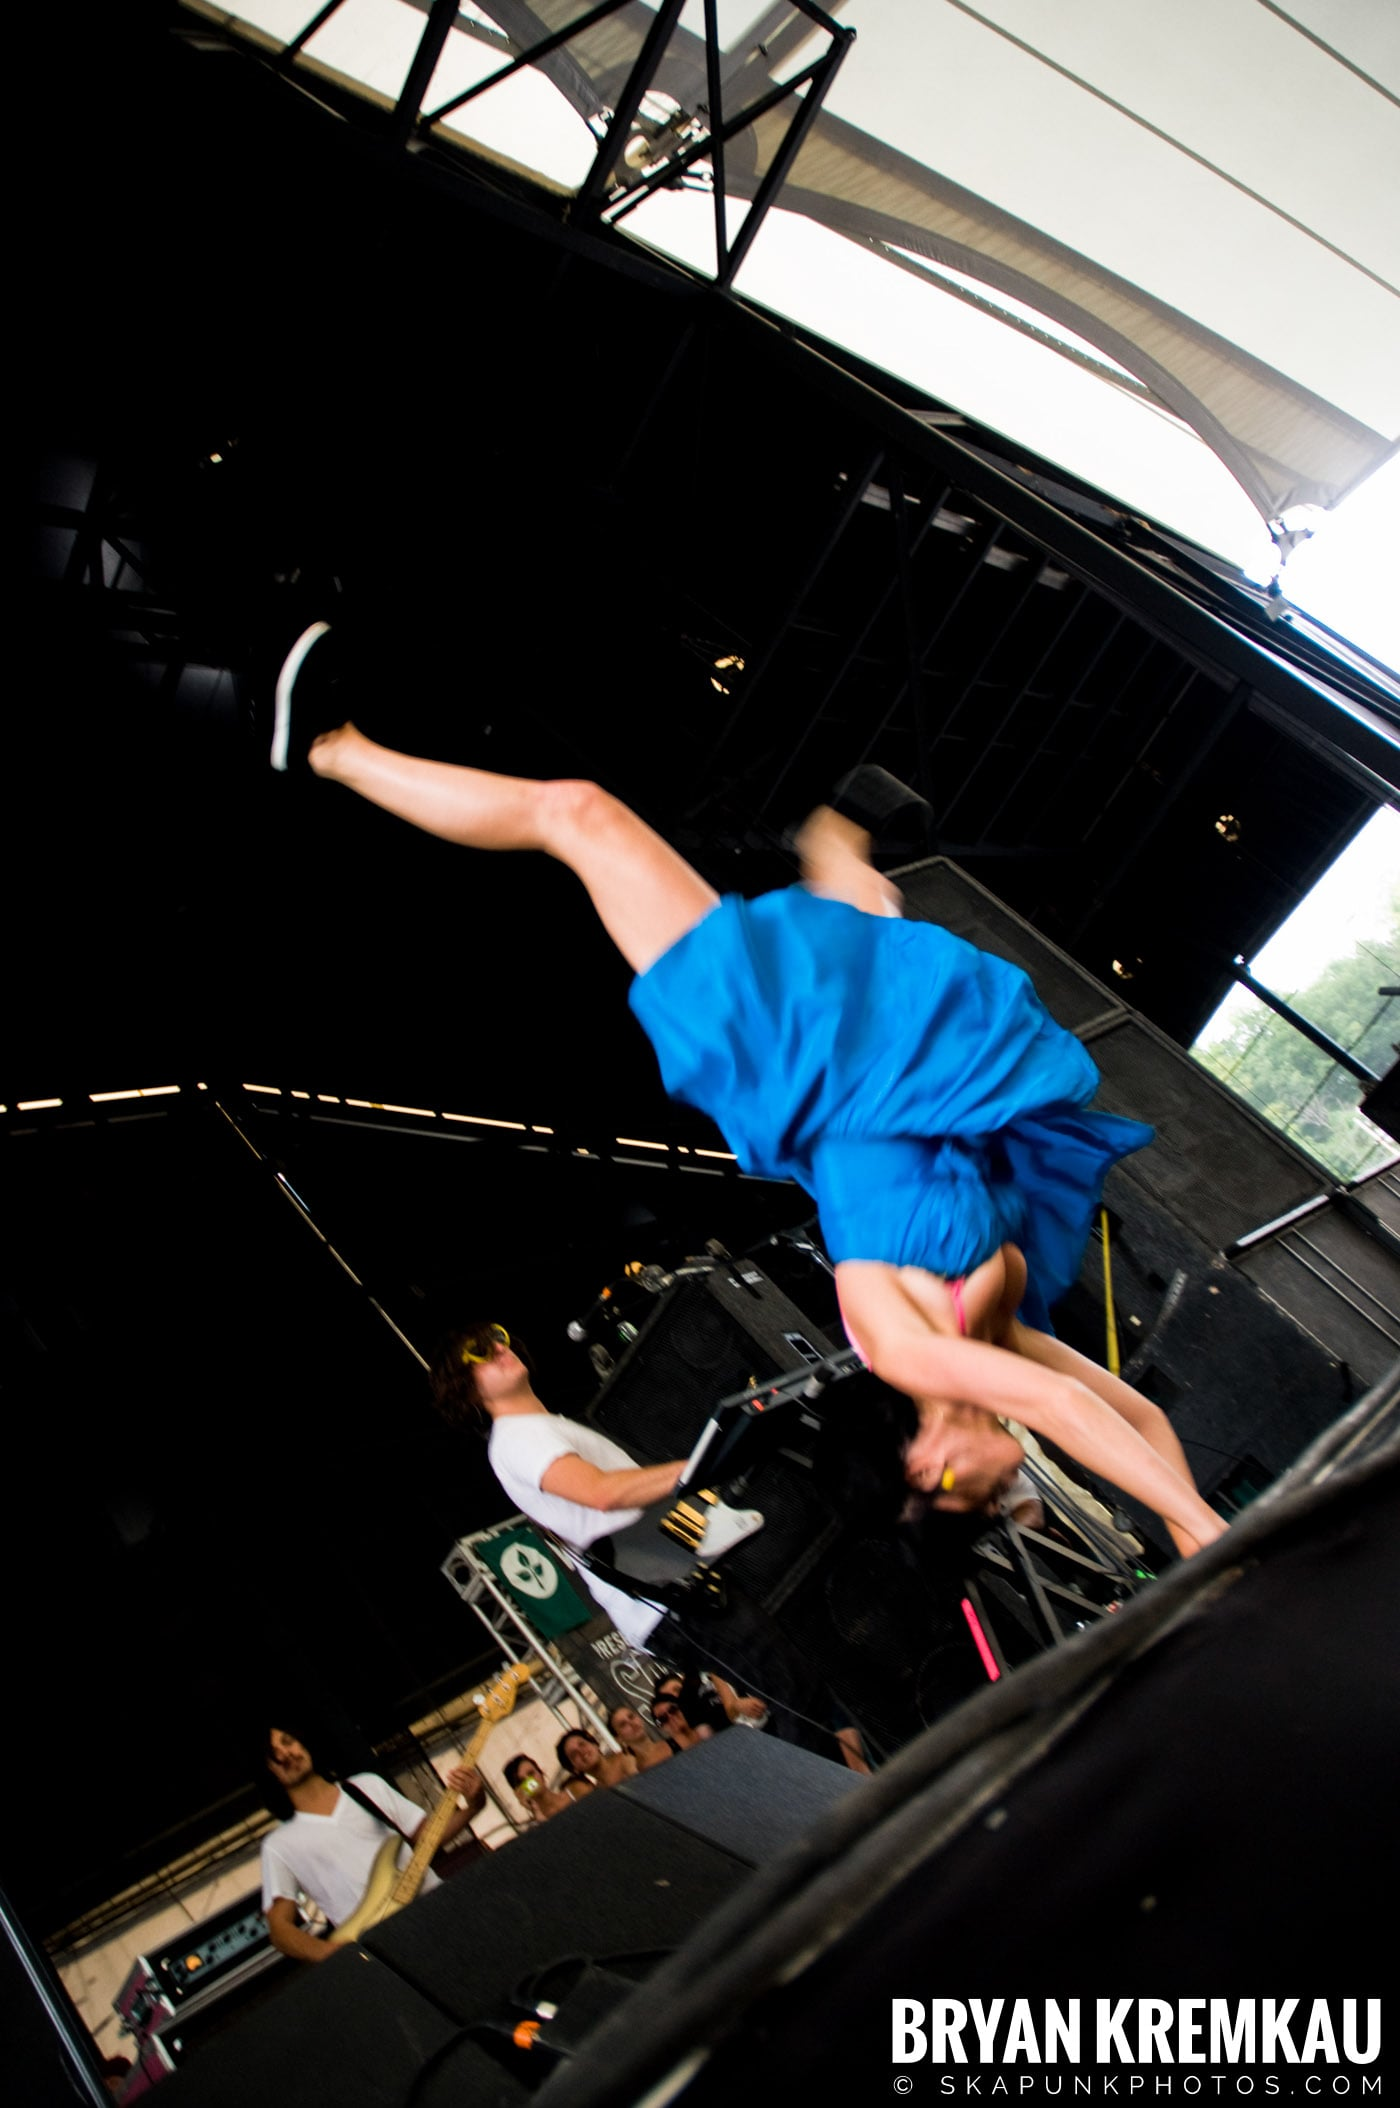 Katy Perry @ Warped Tour, Scranton PA - 7.27.08 (1)